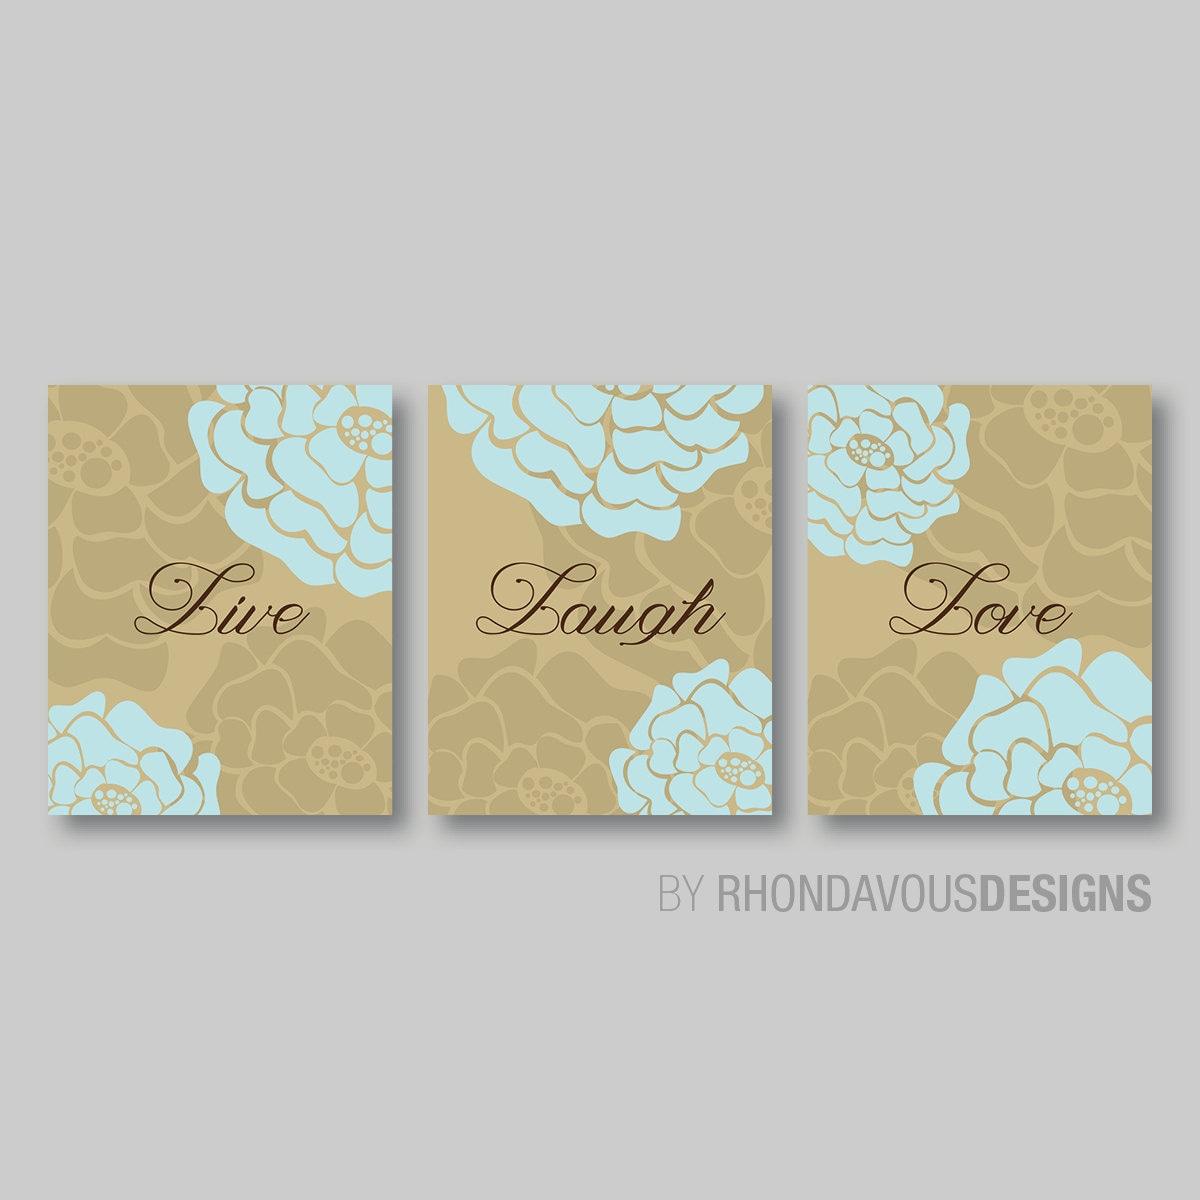 Live Laugh Love Wall Art - Live Laugh Love Decor - Bathroom Art ...